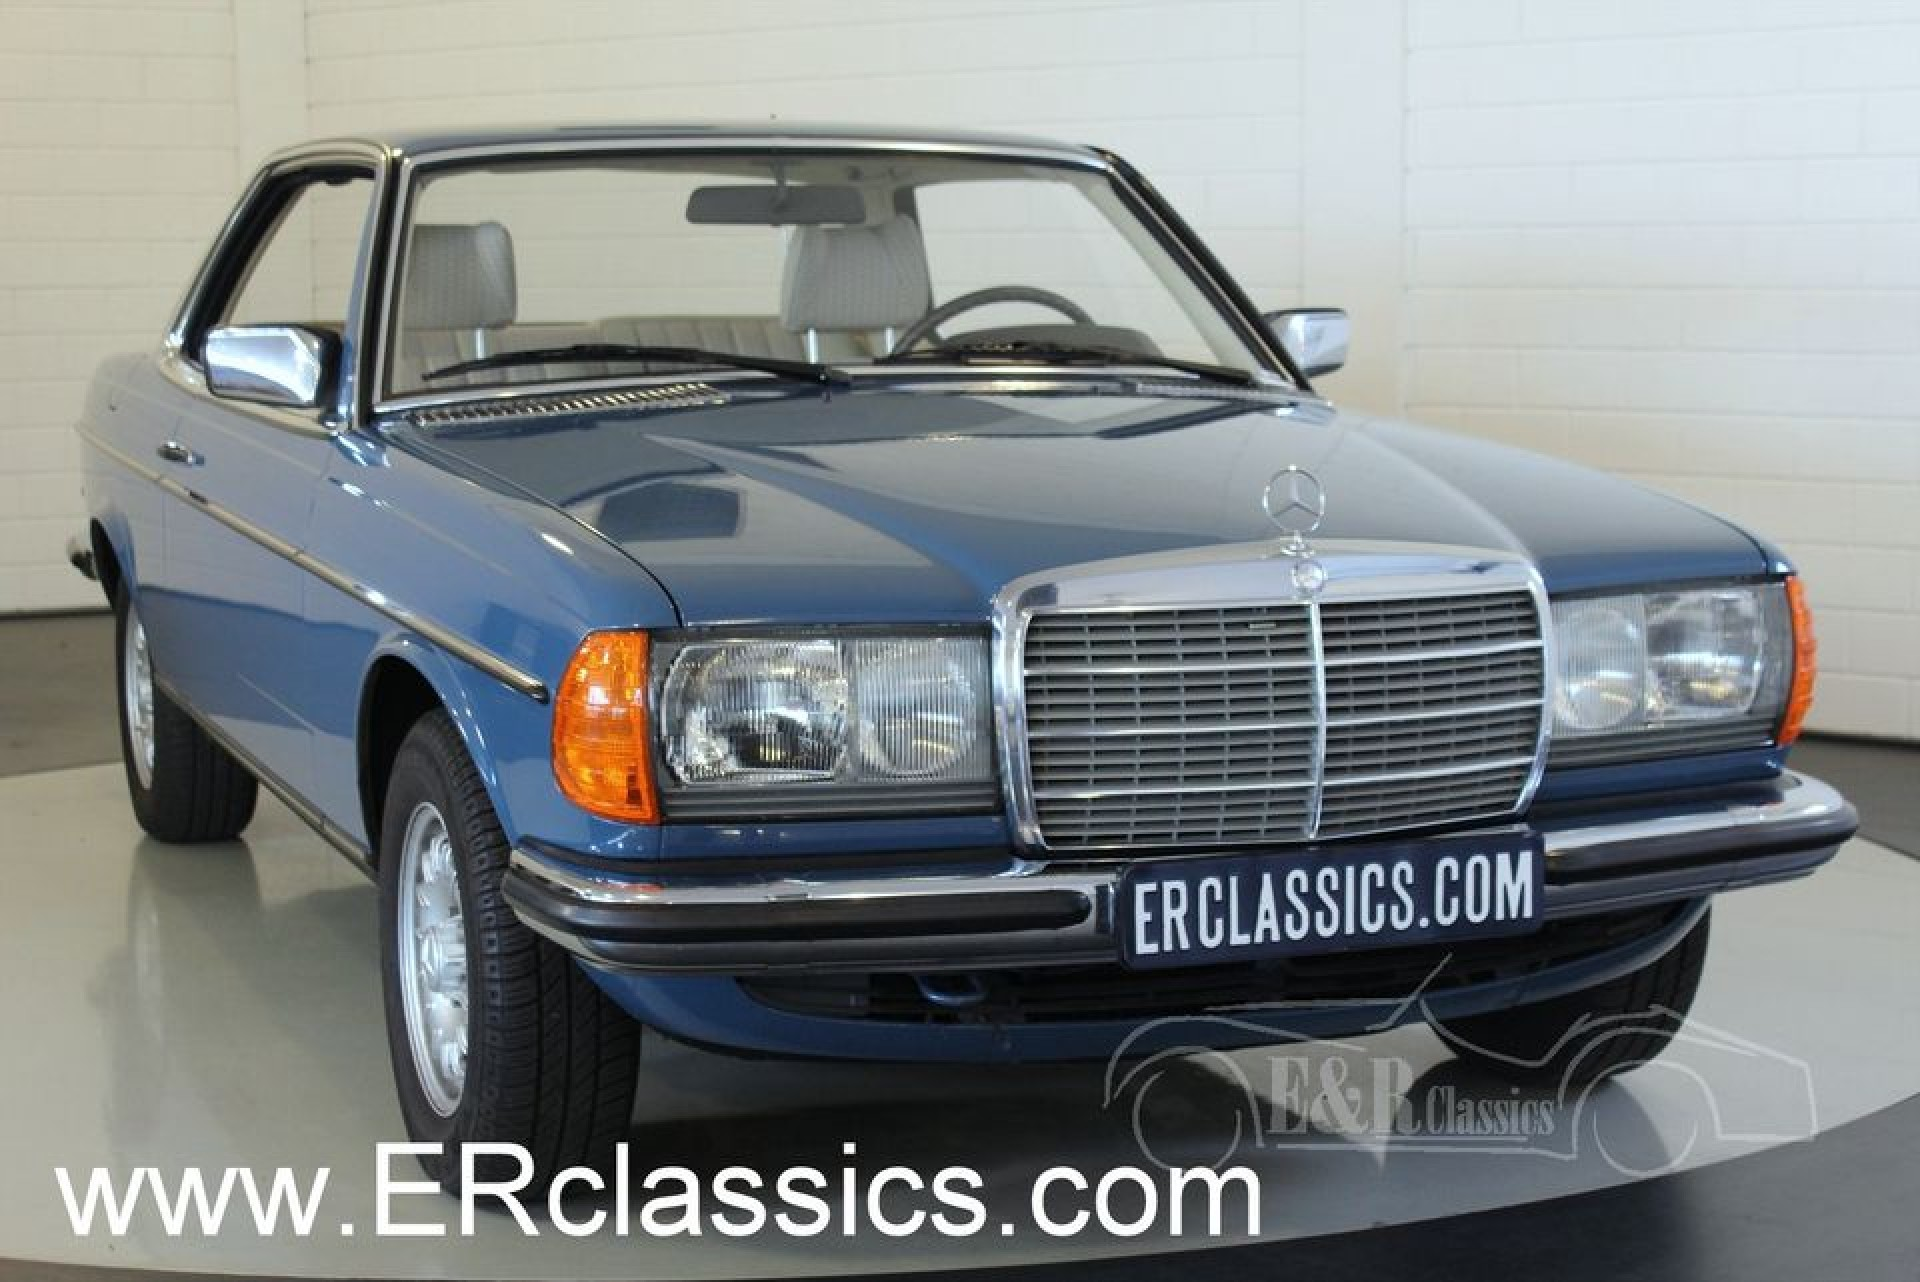 Mercedes benz 230 c 1979 for sale at erclassics for Mercedes benz 1979